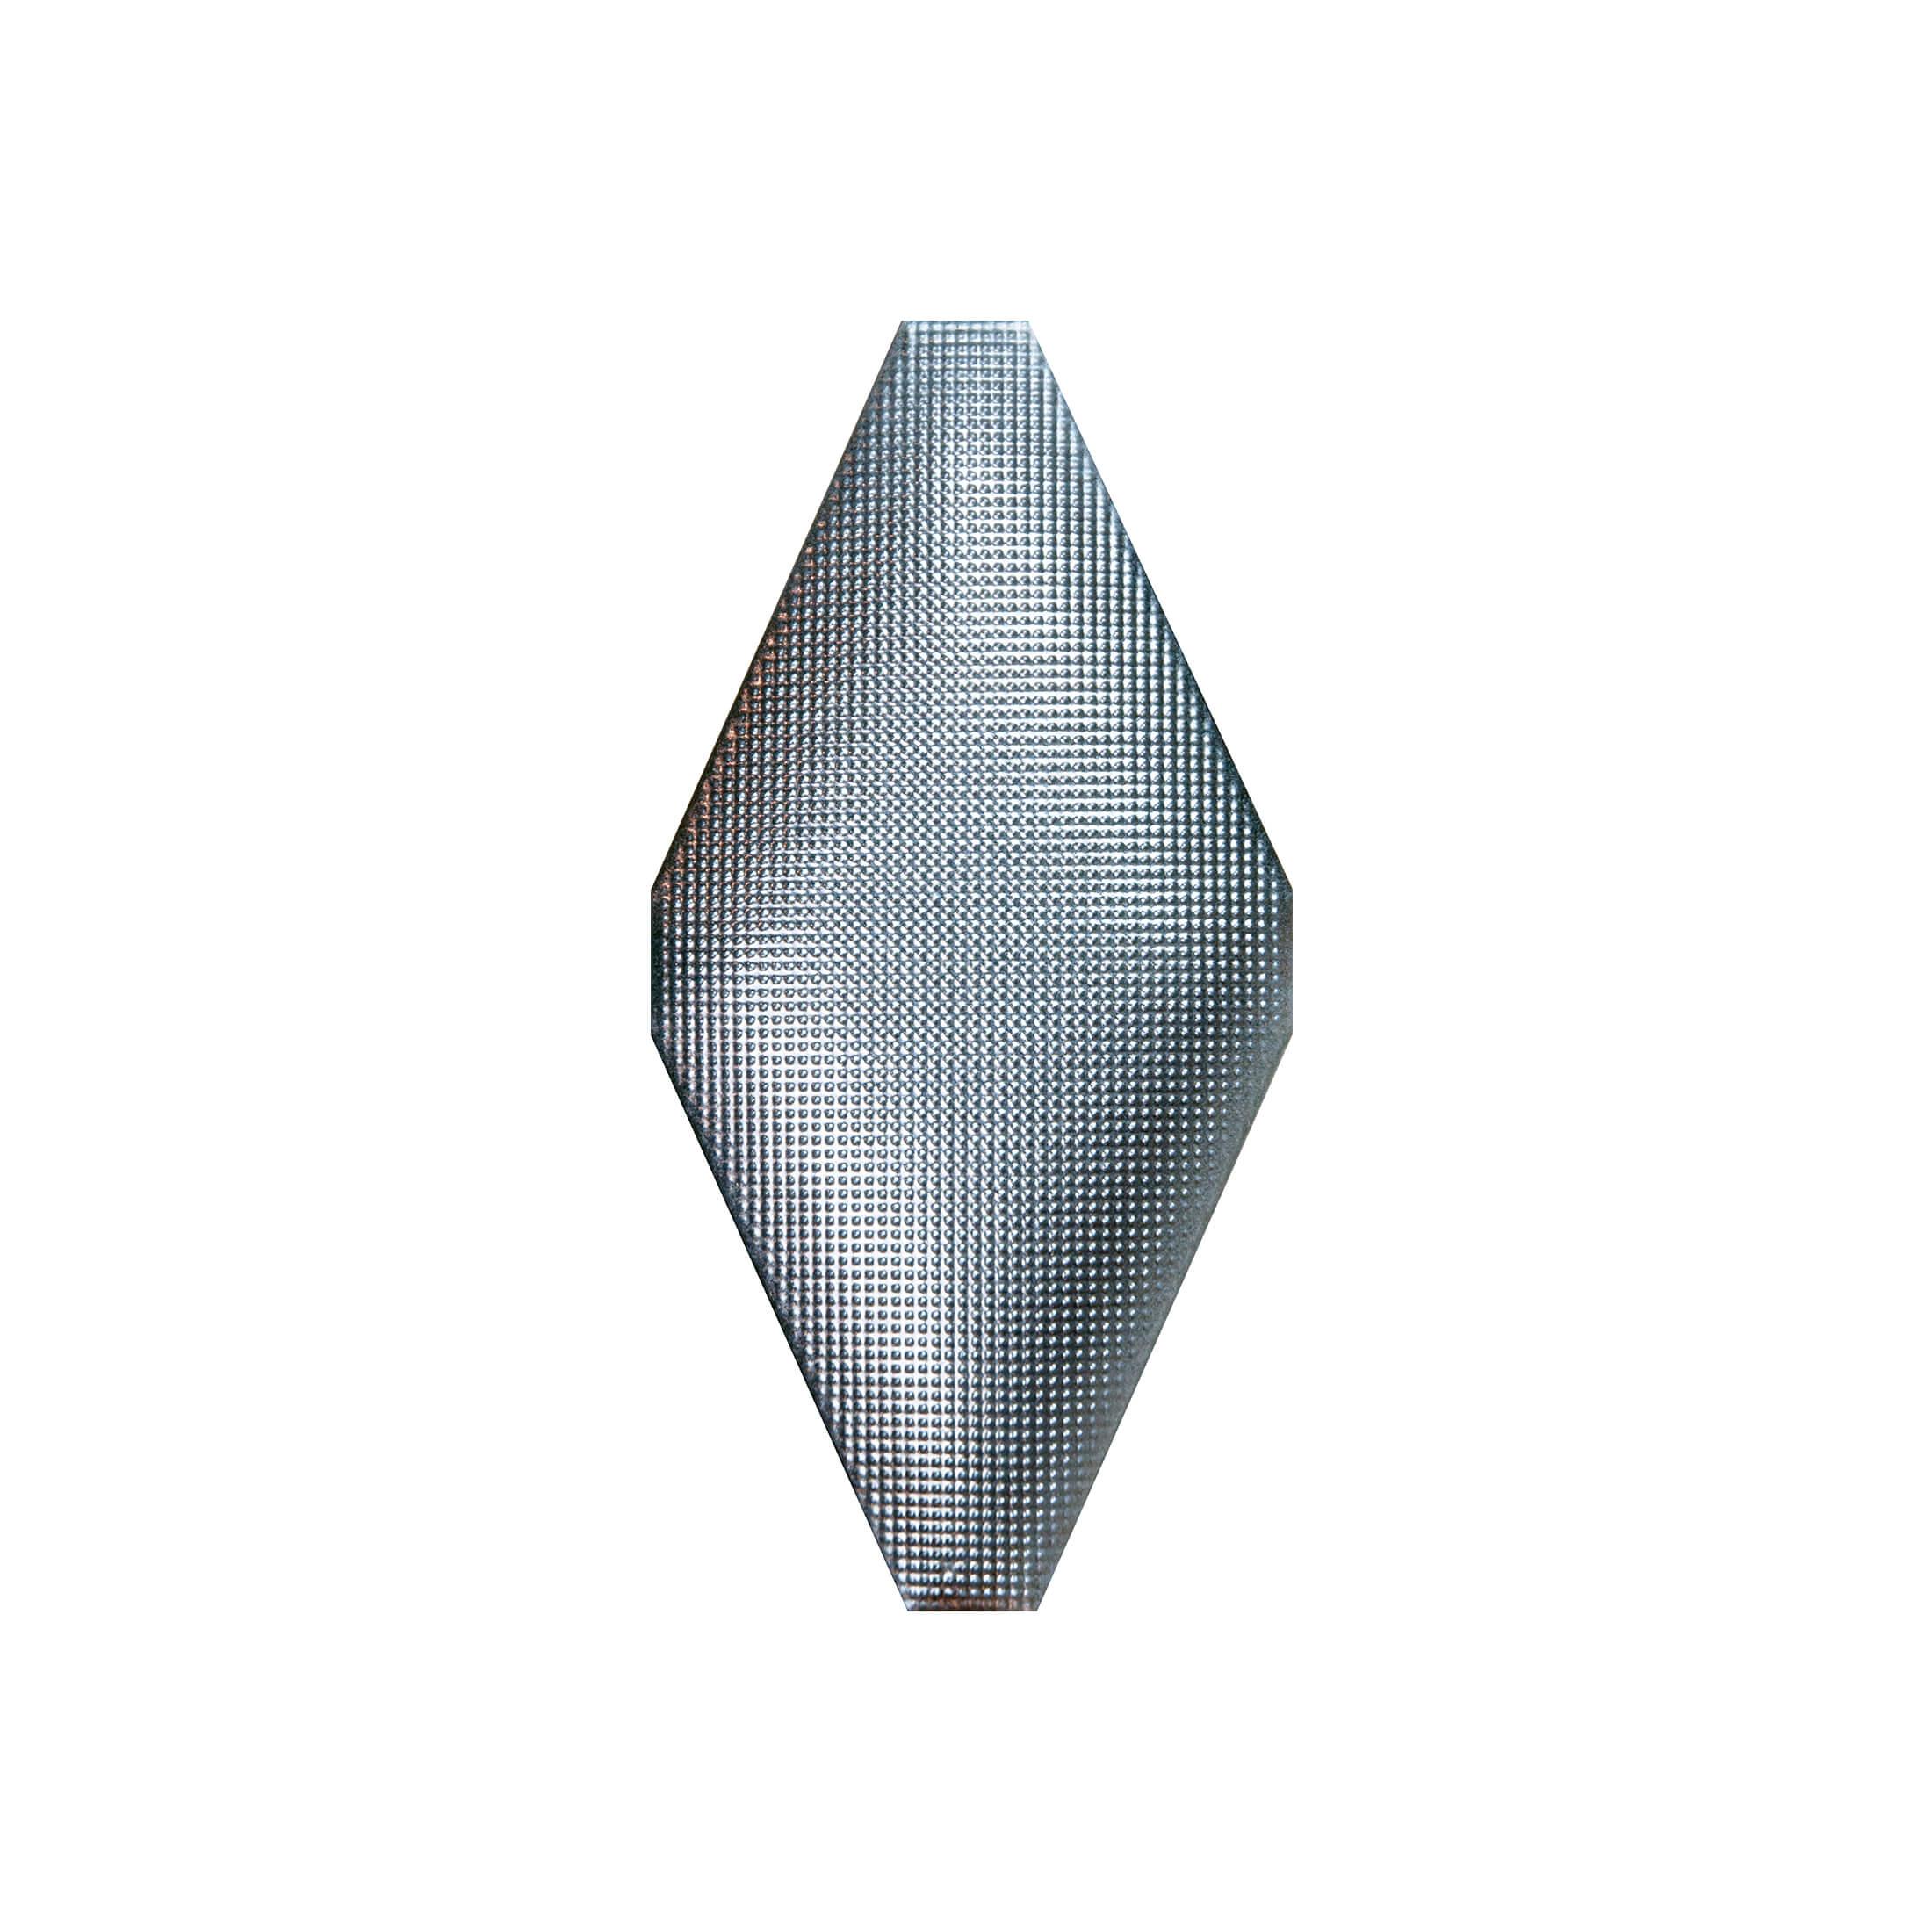 ADNE8124 - ROMBO ACOLCHADO PLATINO - 10 cm X 20 cm